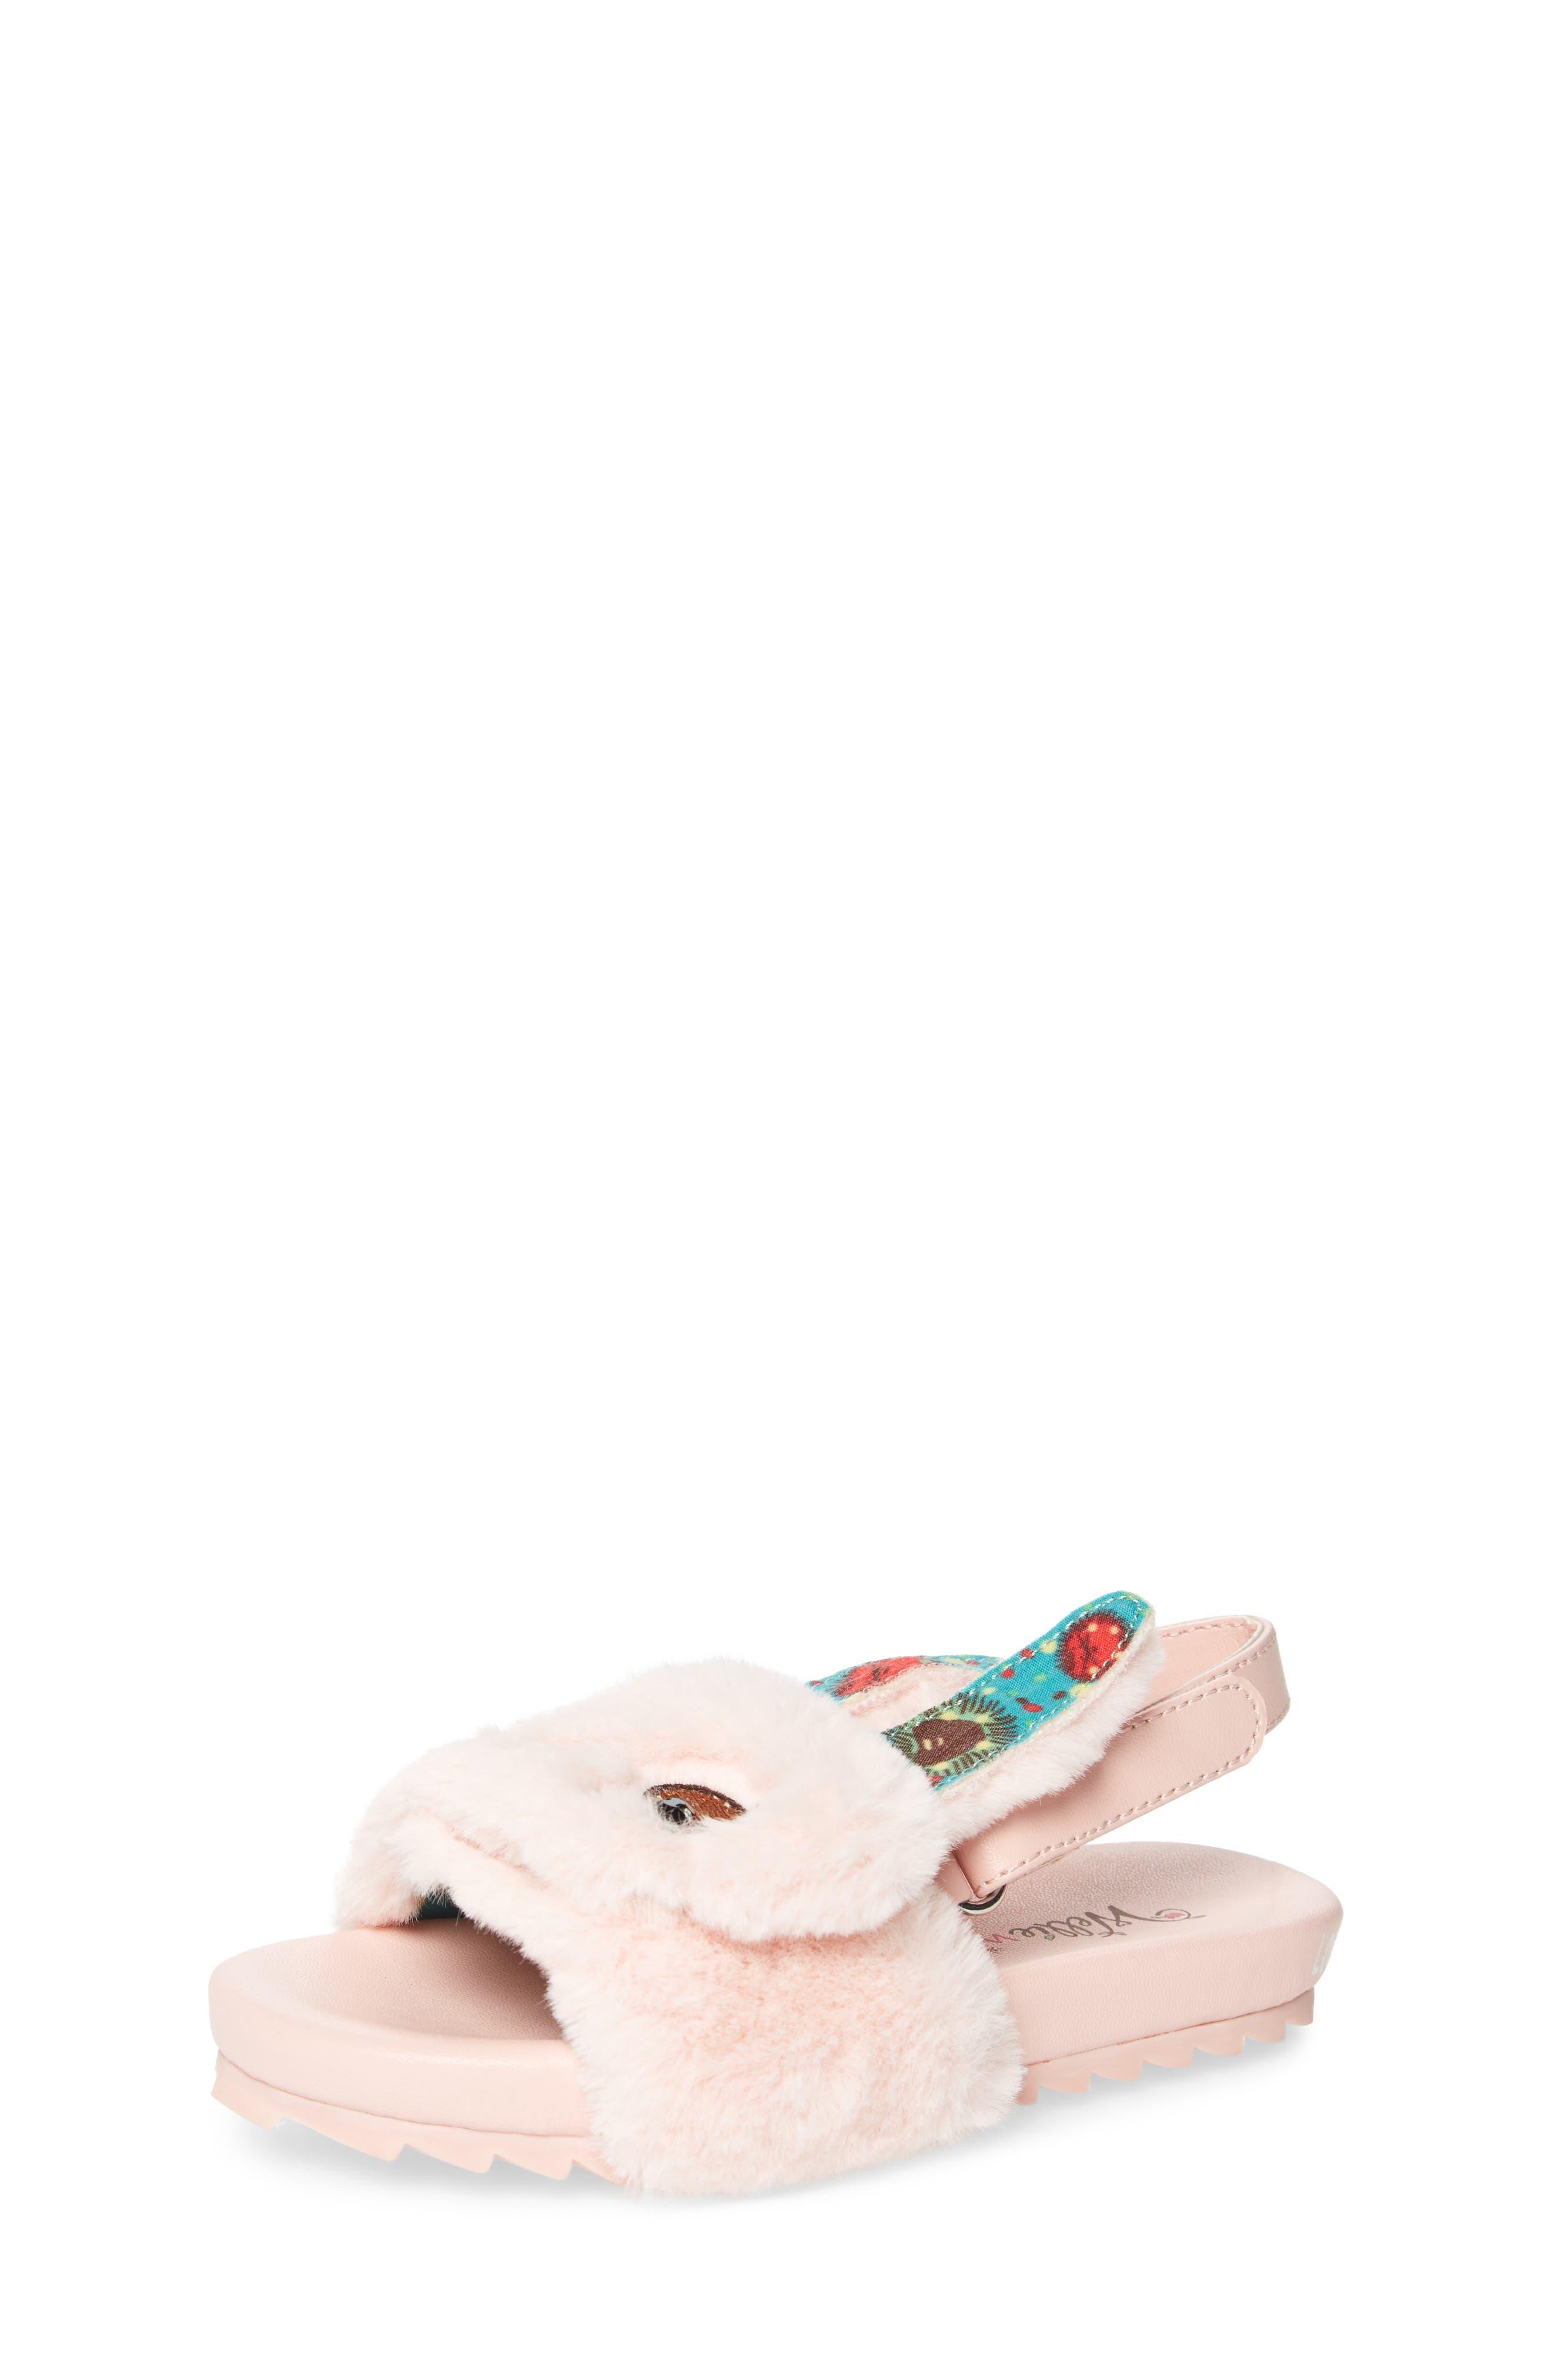 Willa Carrot Faux Fur Strap Slide Sandal,                             Main thumbnail 1, color,                             697